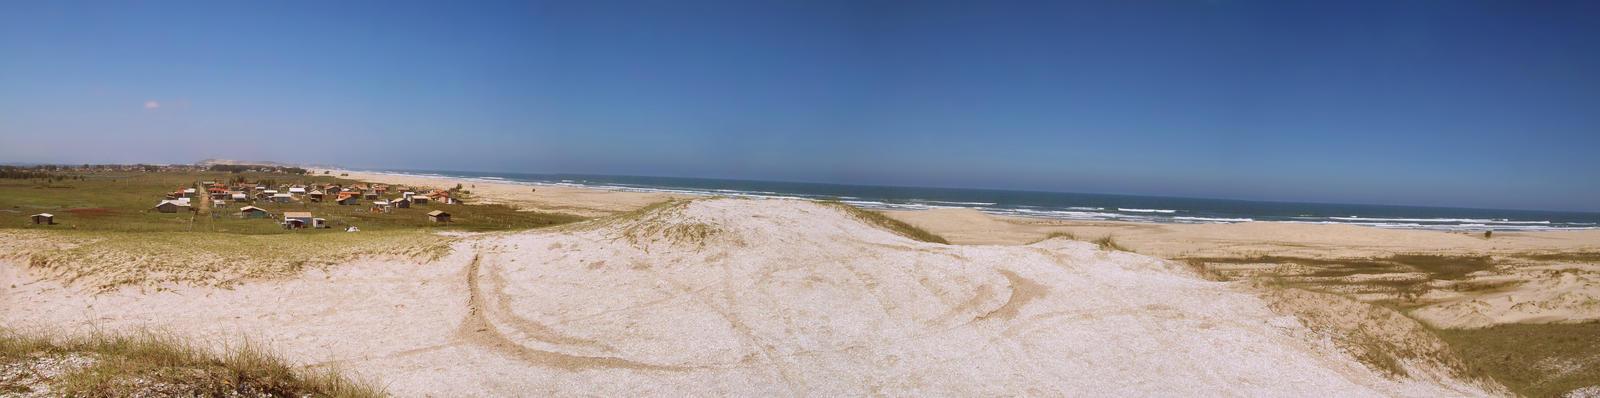 Sambaqui Dunes - Camacho, SC, Brazil (Panorama 5) by Ishtaryu